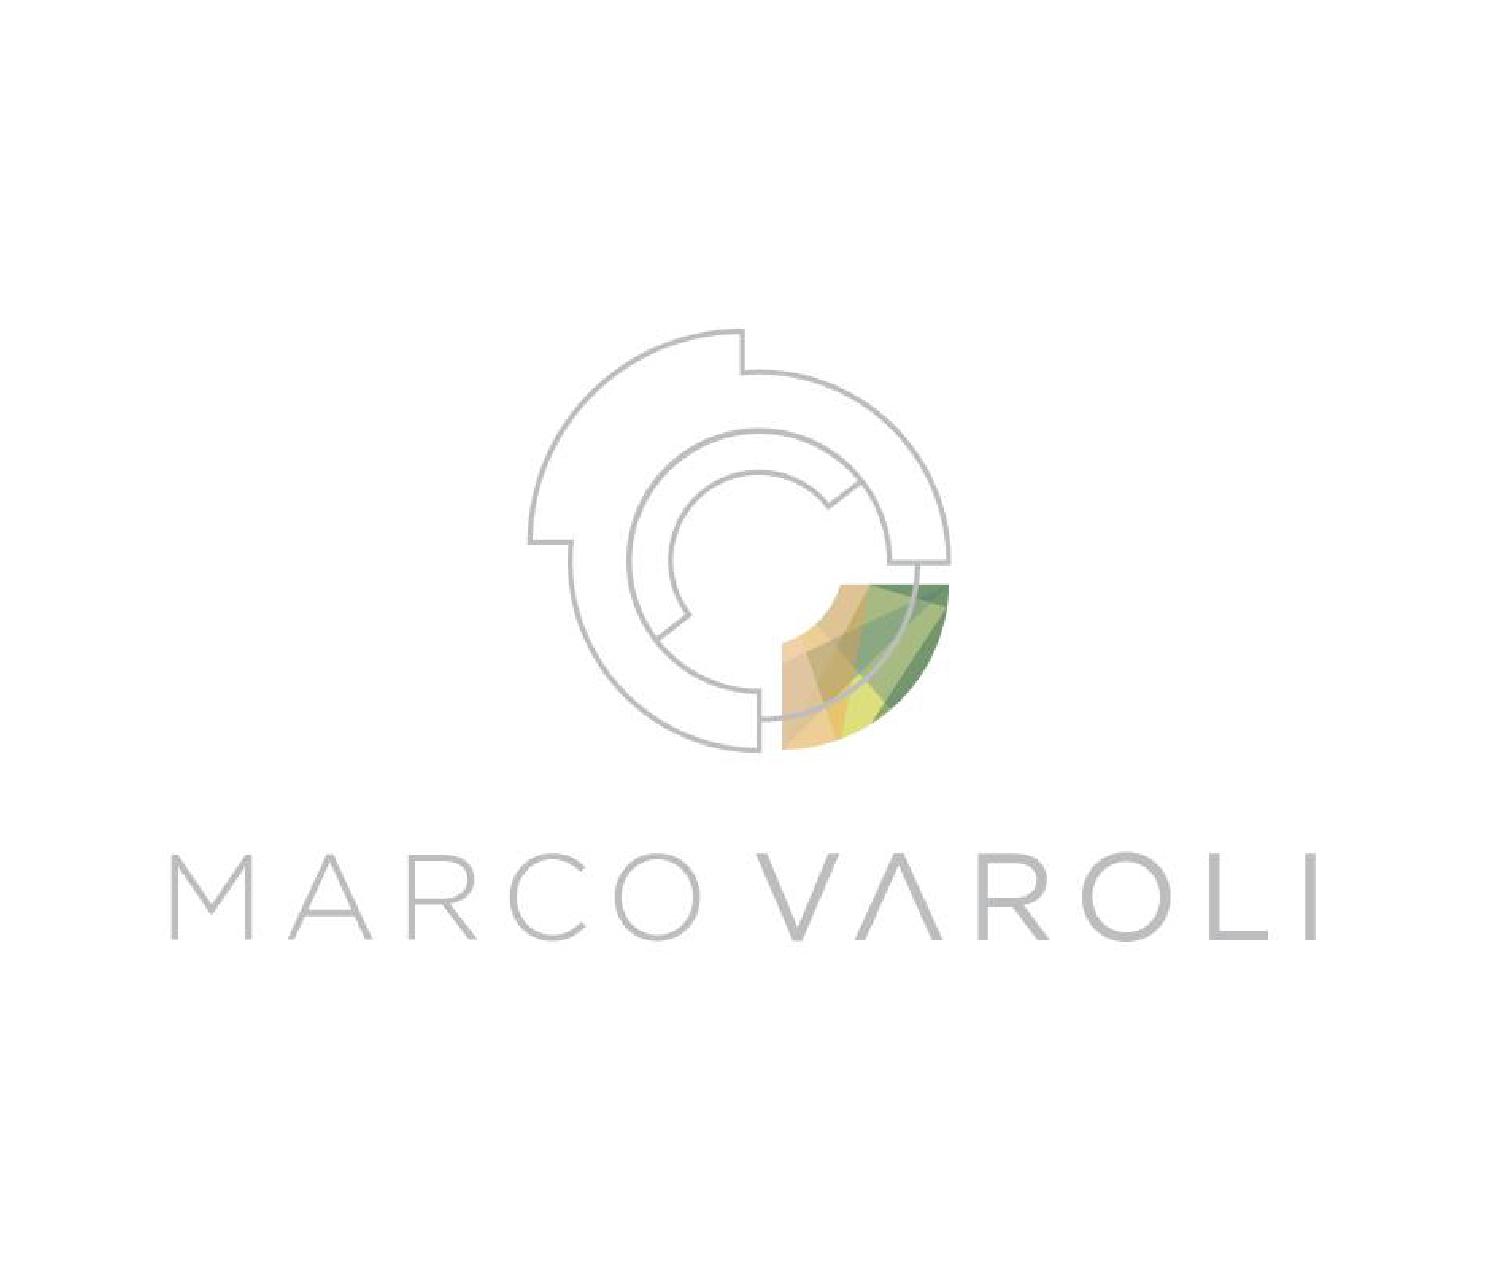 MARCO VAROLI - Photographe